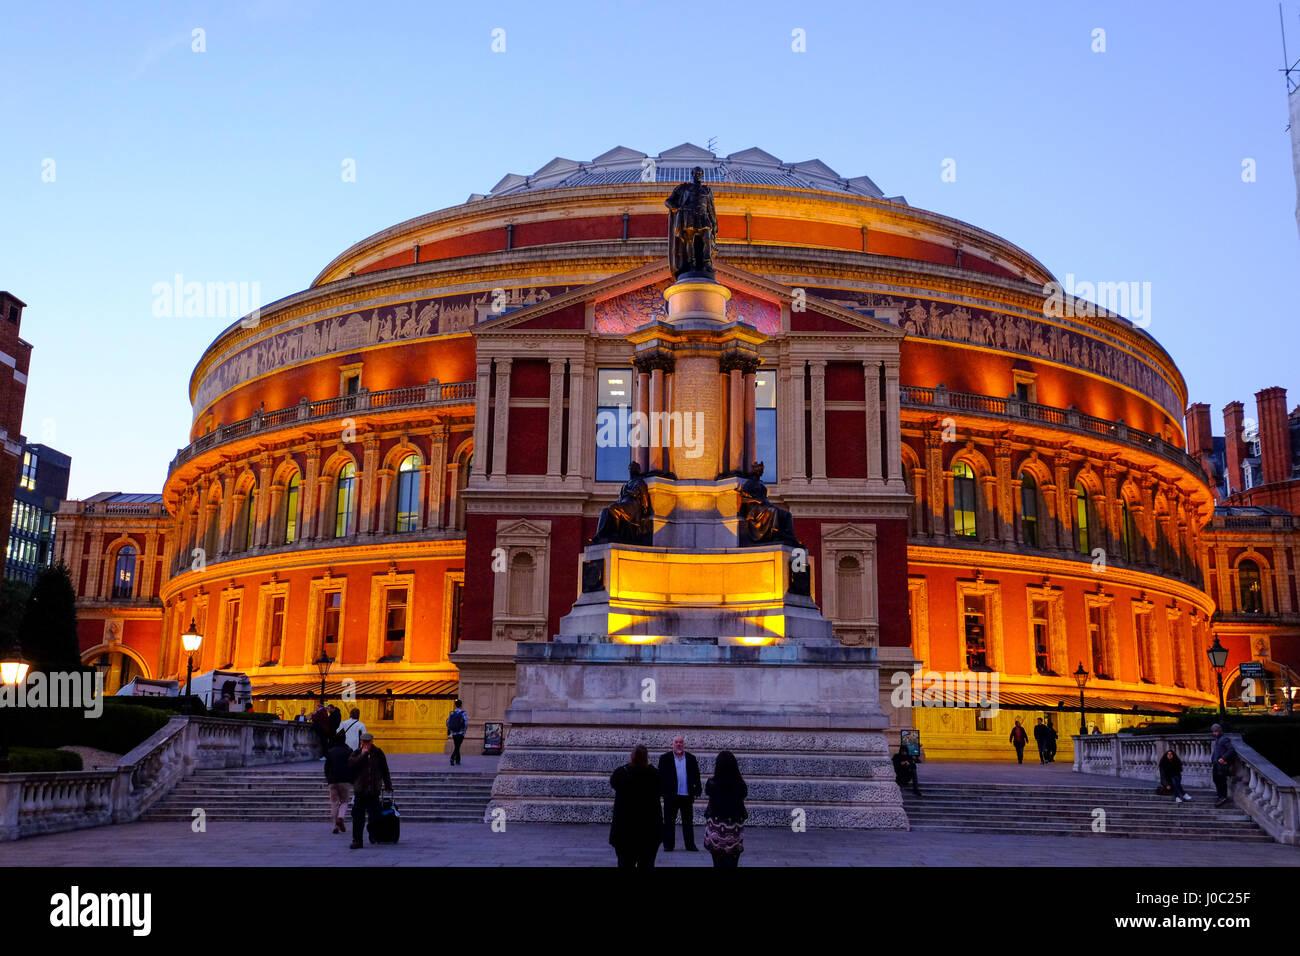 Royal Albert Hall, Kensington, London, England, UK Photo Stock